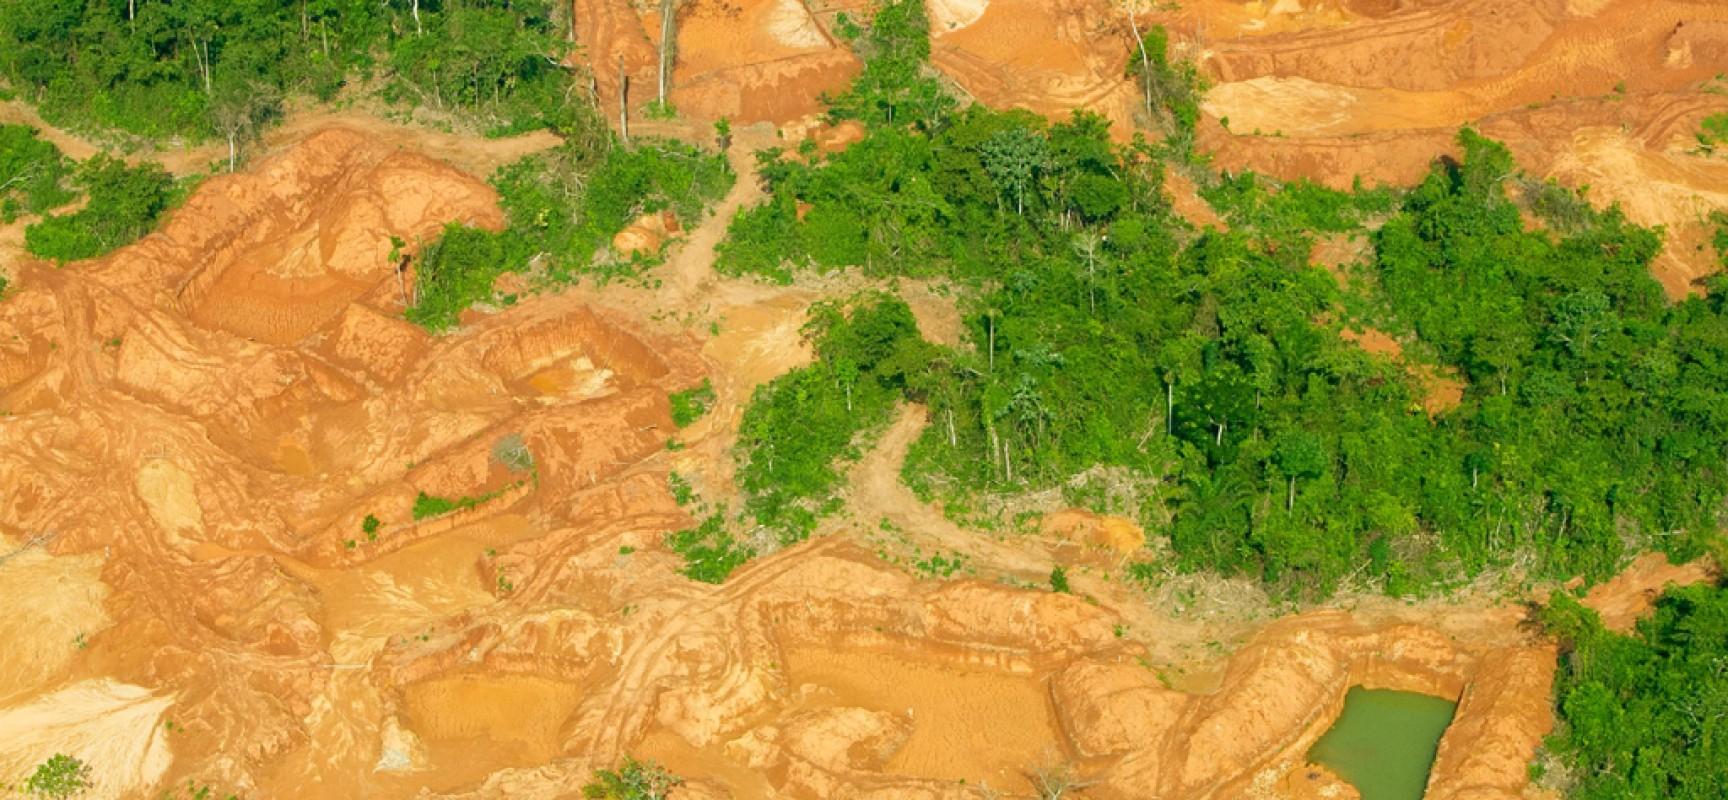 Funai e Ibama desativam garimpos ilegais na Terra Indígena (TI) Kayapó, no Sul do Pará